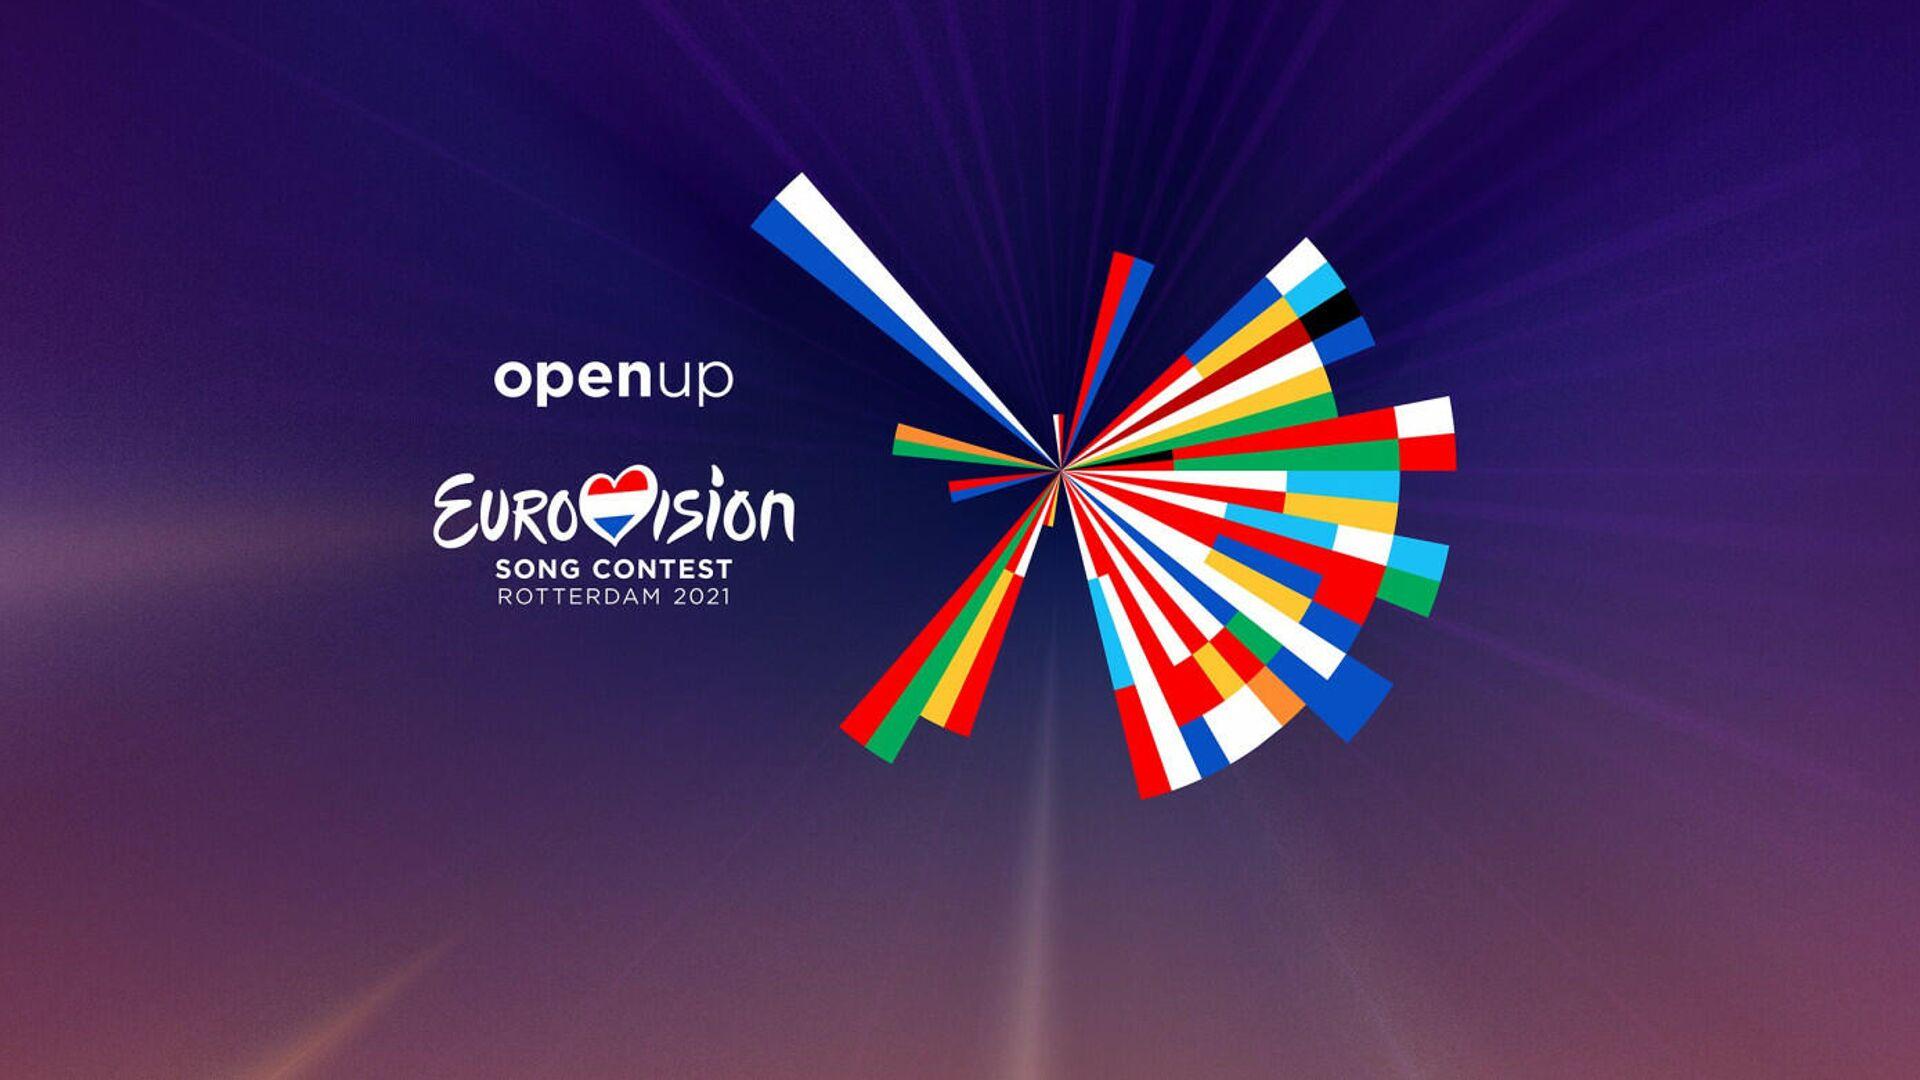 Евровидение 2021 - РИА Новости, 1920, 16.05.2021